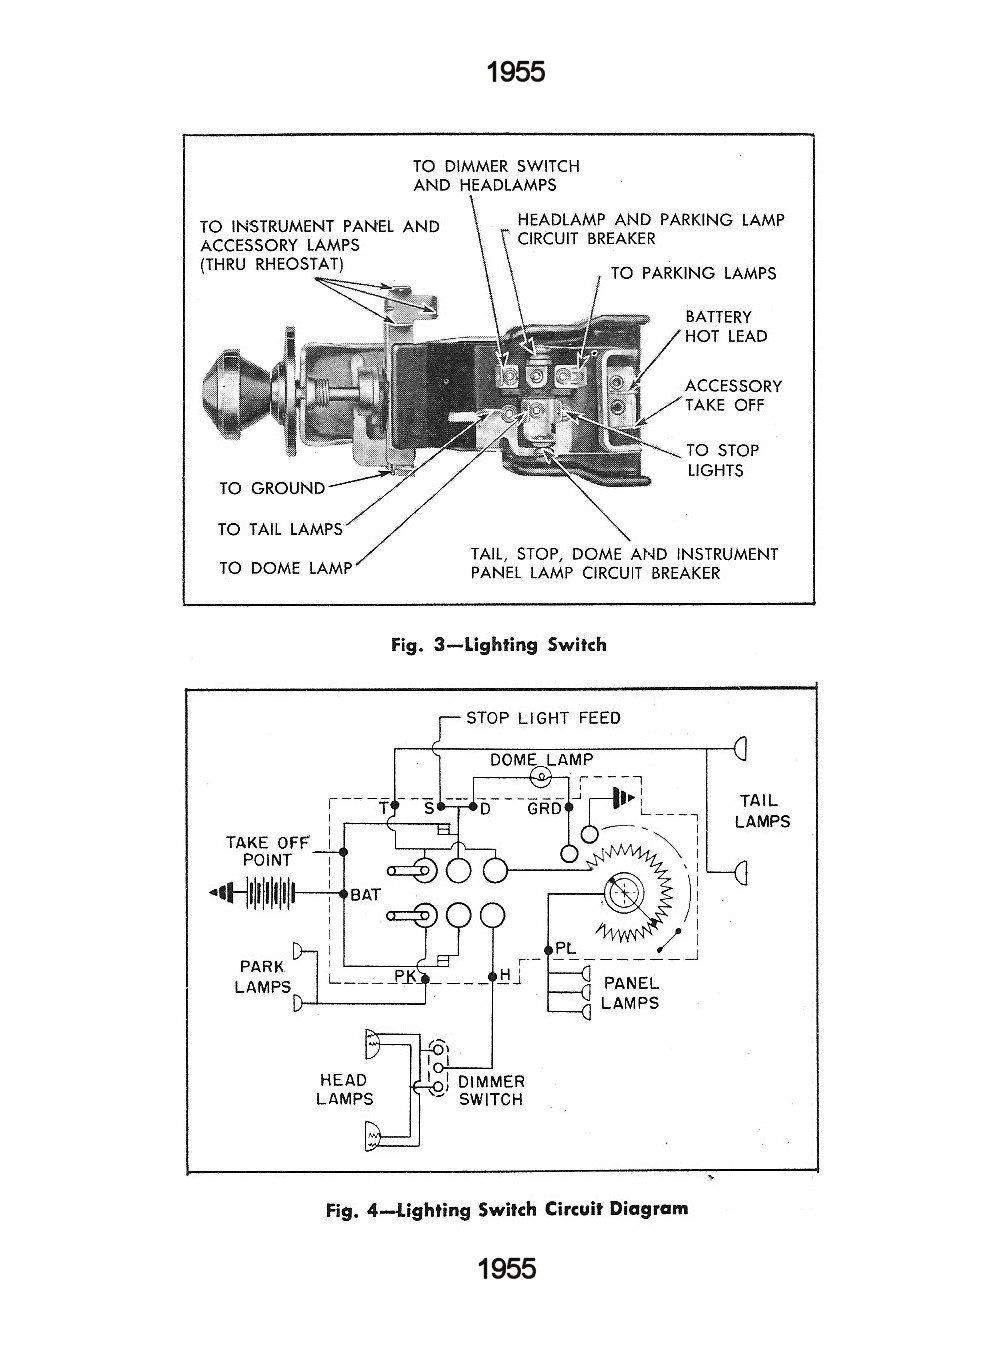 Pleasing 1984 Chevy C10 Fuse Box Diagram Basic Electronics Wiring Diagram Wiring Cloud Hemtegremohammedshrineorg